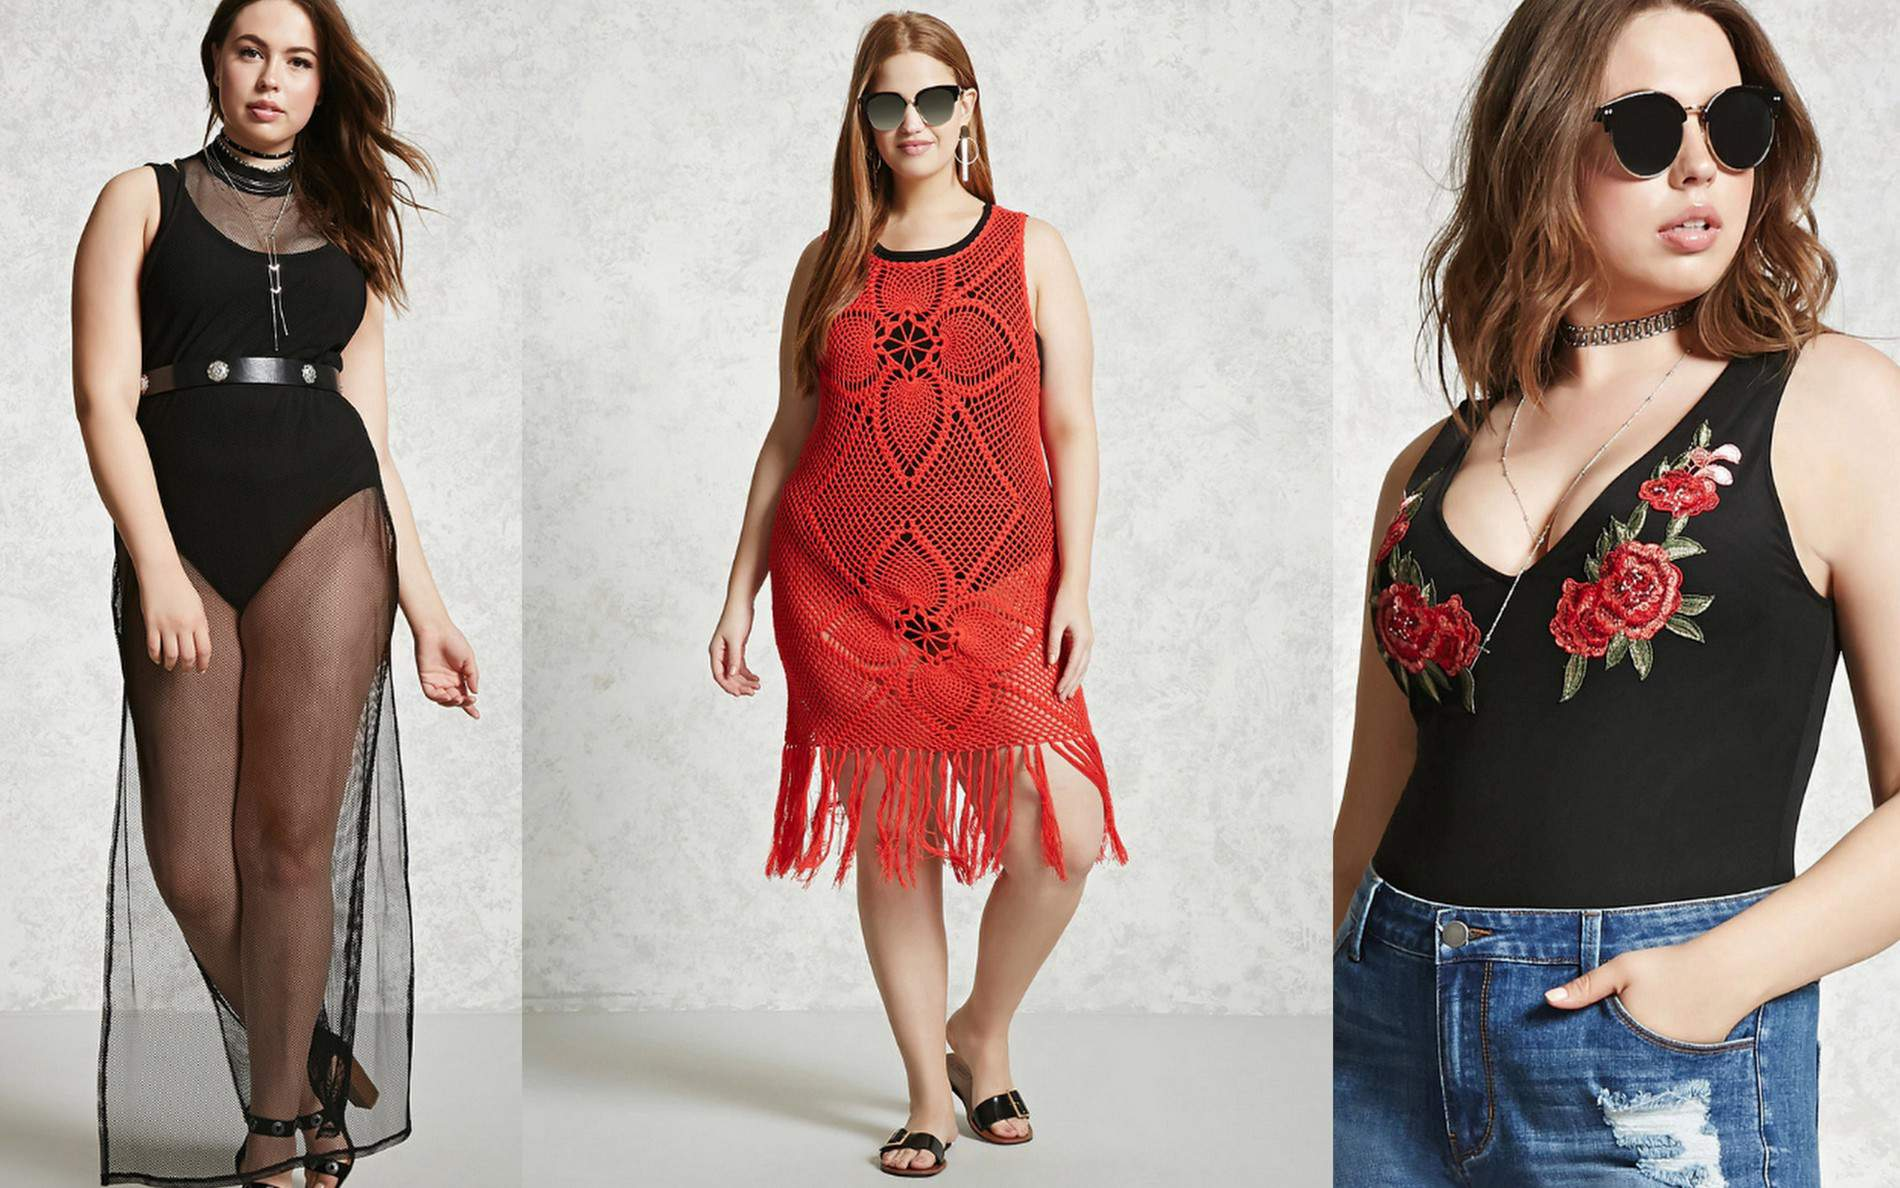 fedd4fc5d1 Missed Coachella  8 Plus Size Festival Fashions To Rock Anyway!